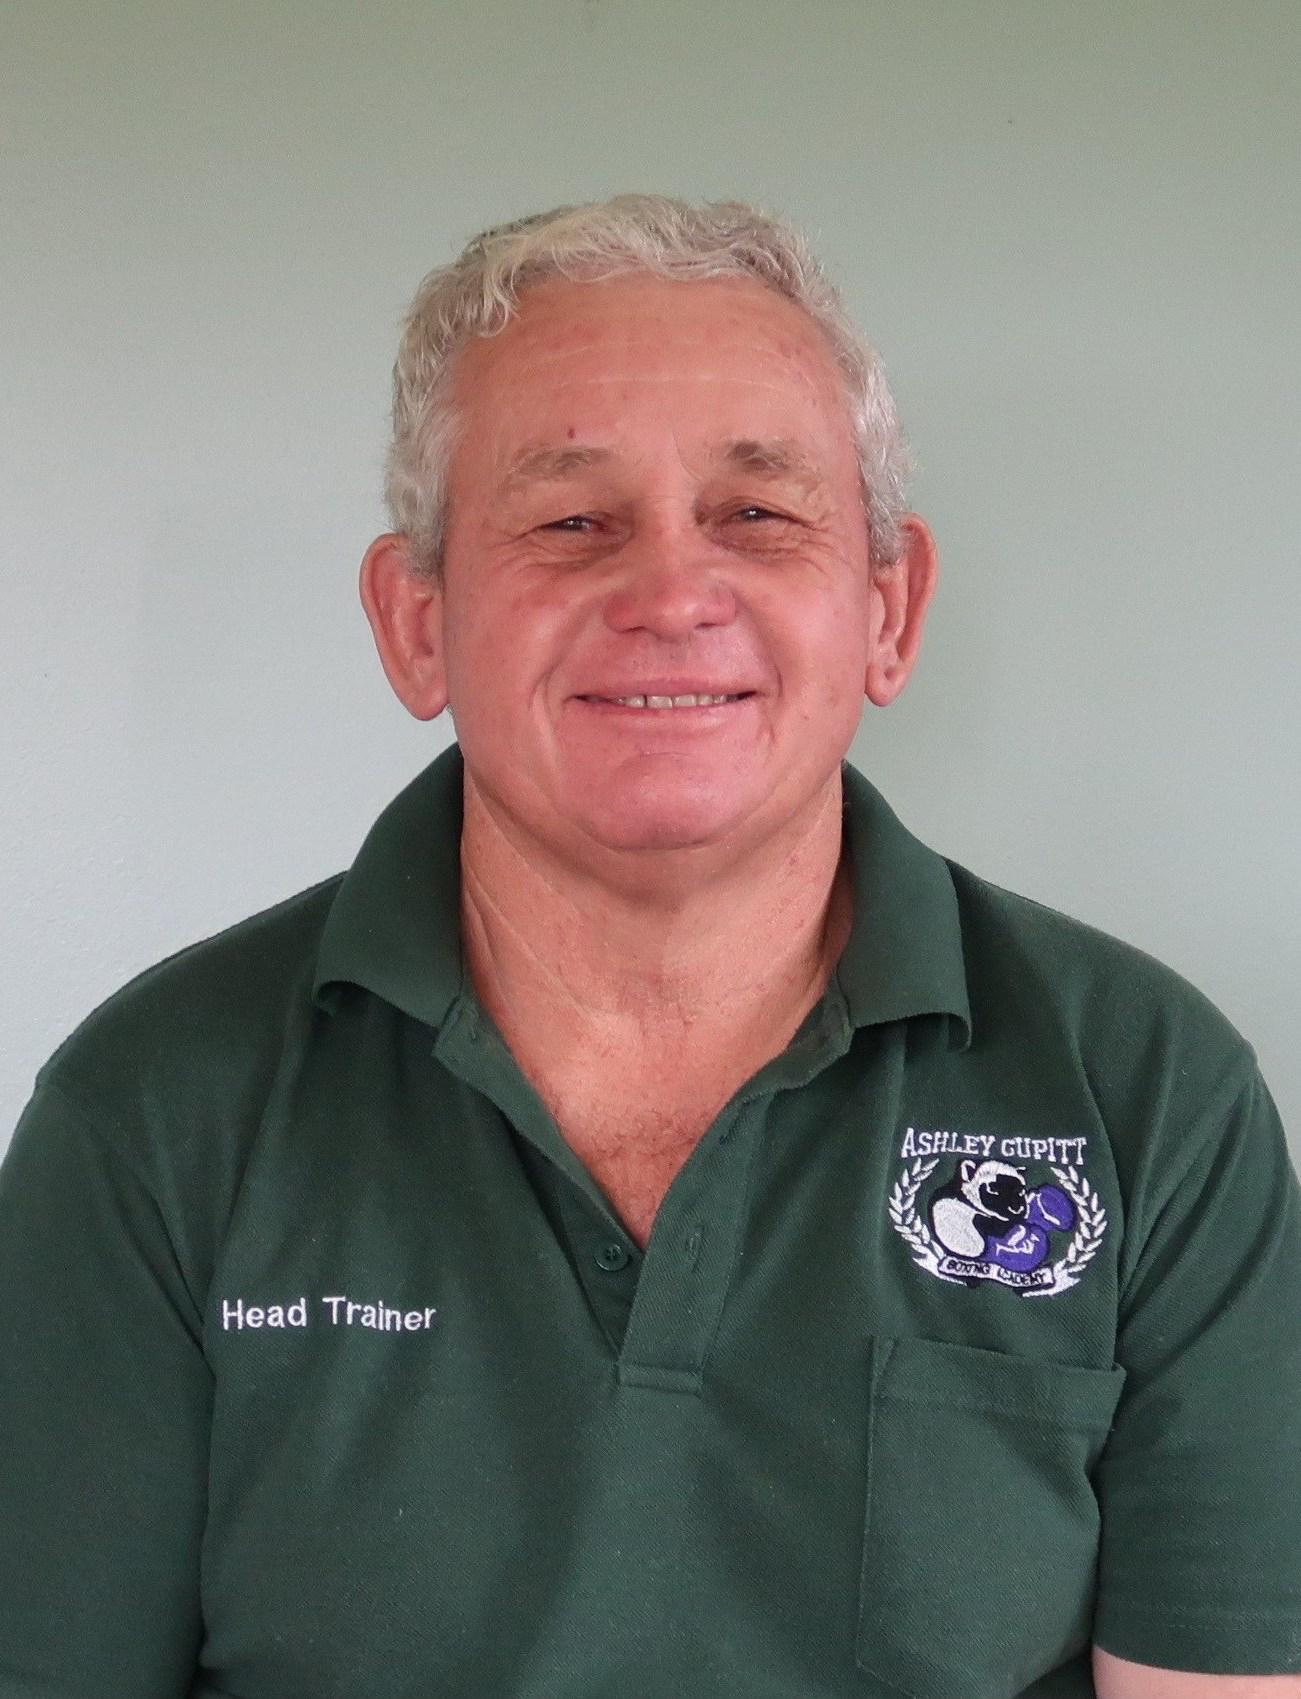 Ashley Cupitt, Head Trainer.